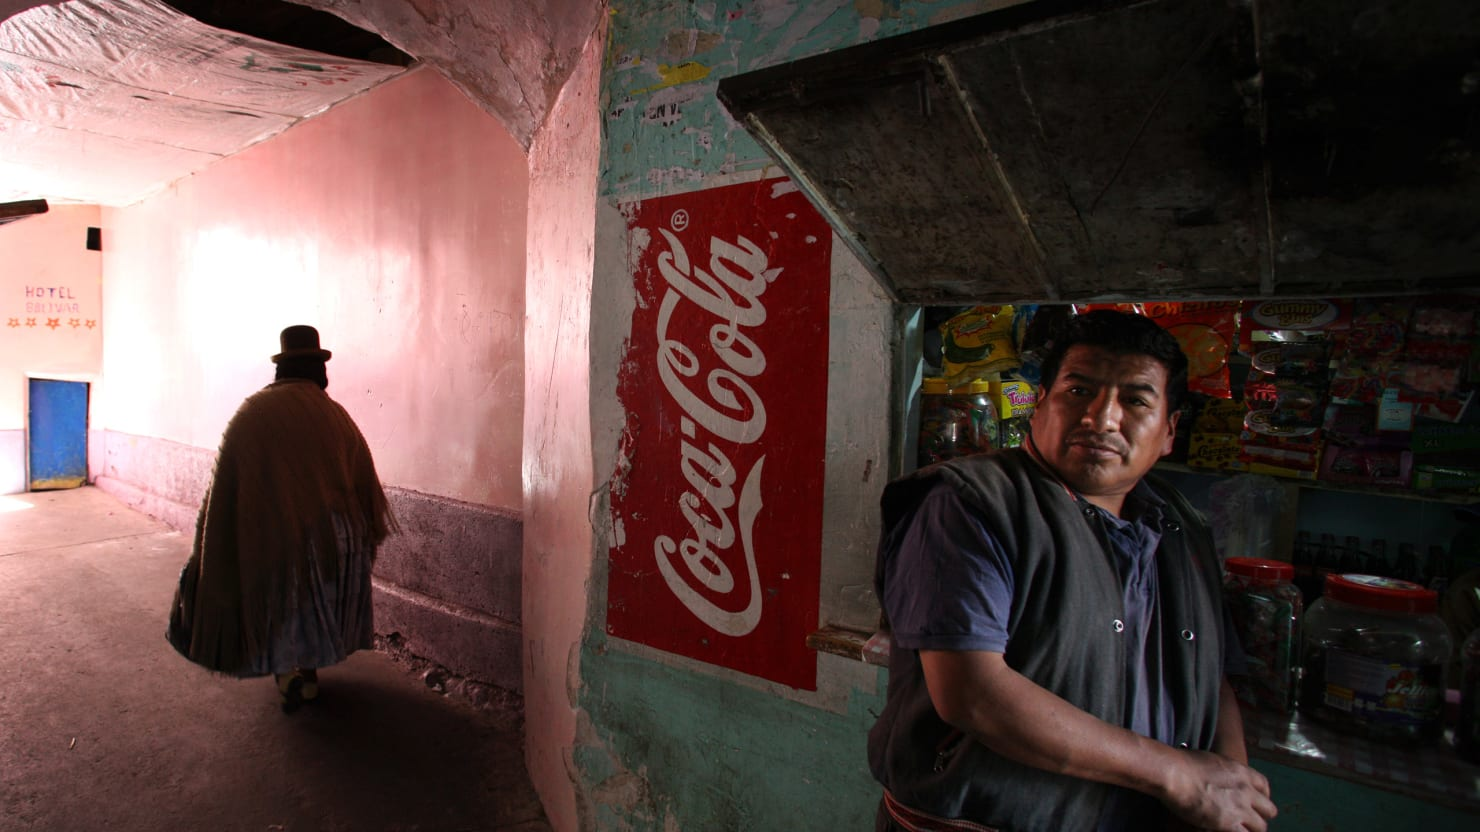 Cocaine, Politicians and Wives: Inside the World's Most Bizarre Prison